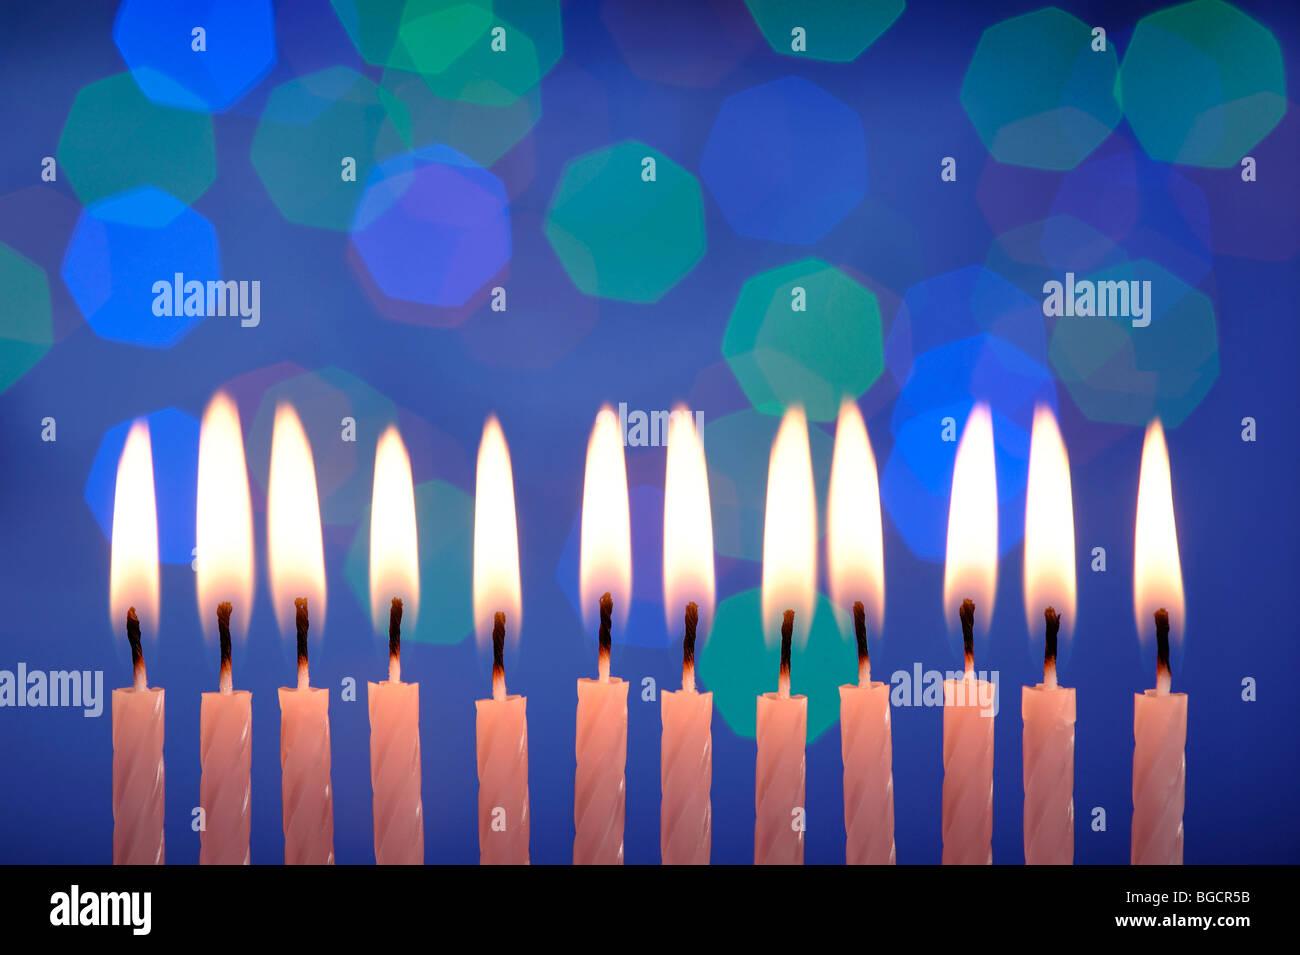 12 birthday candles - Stock Image